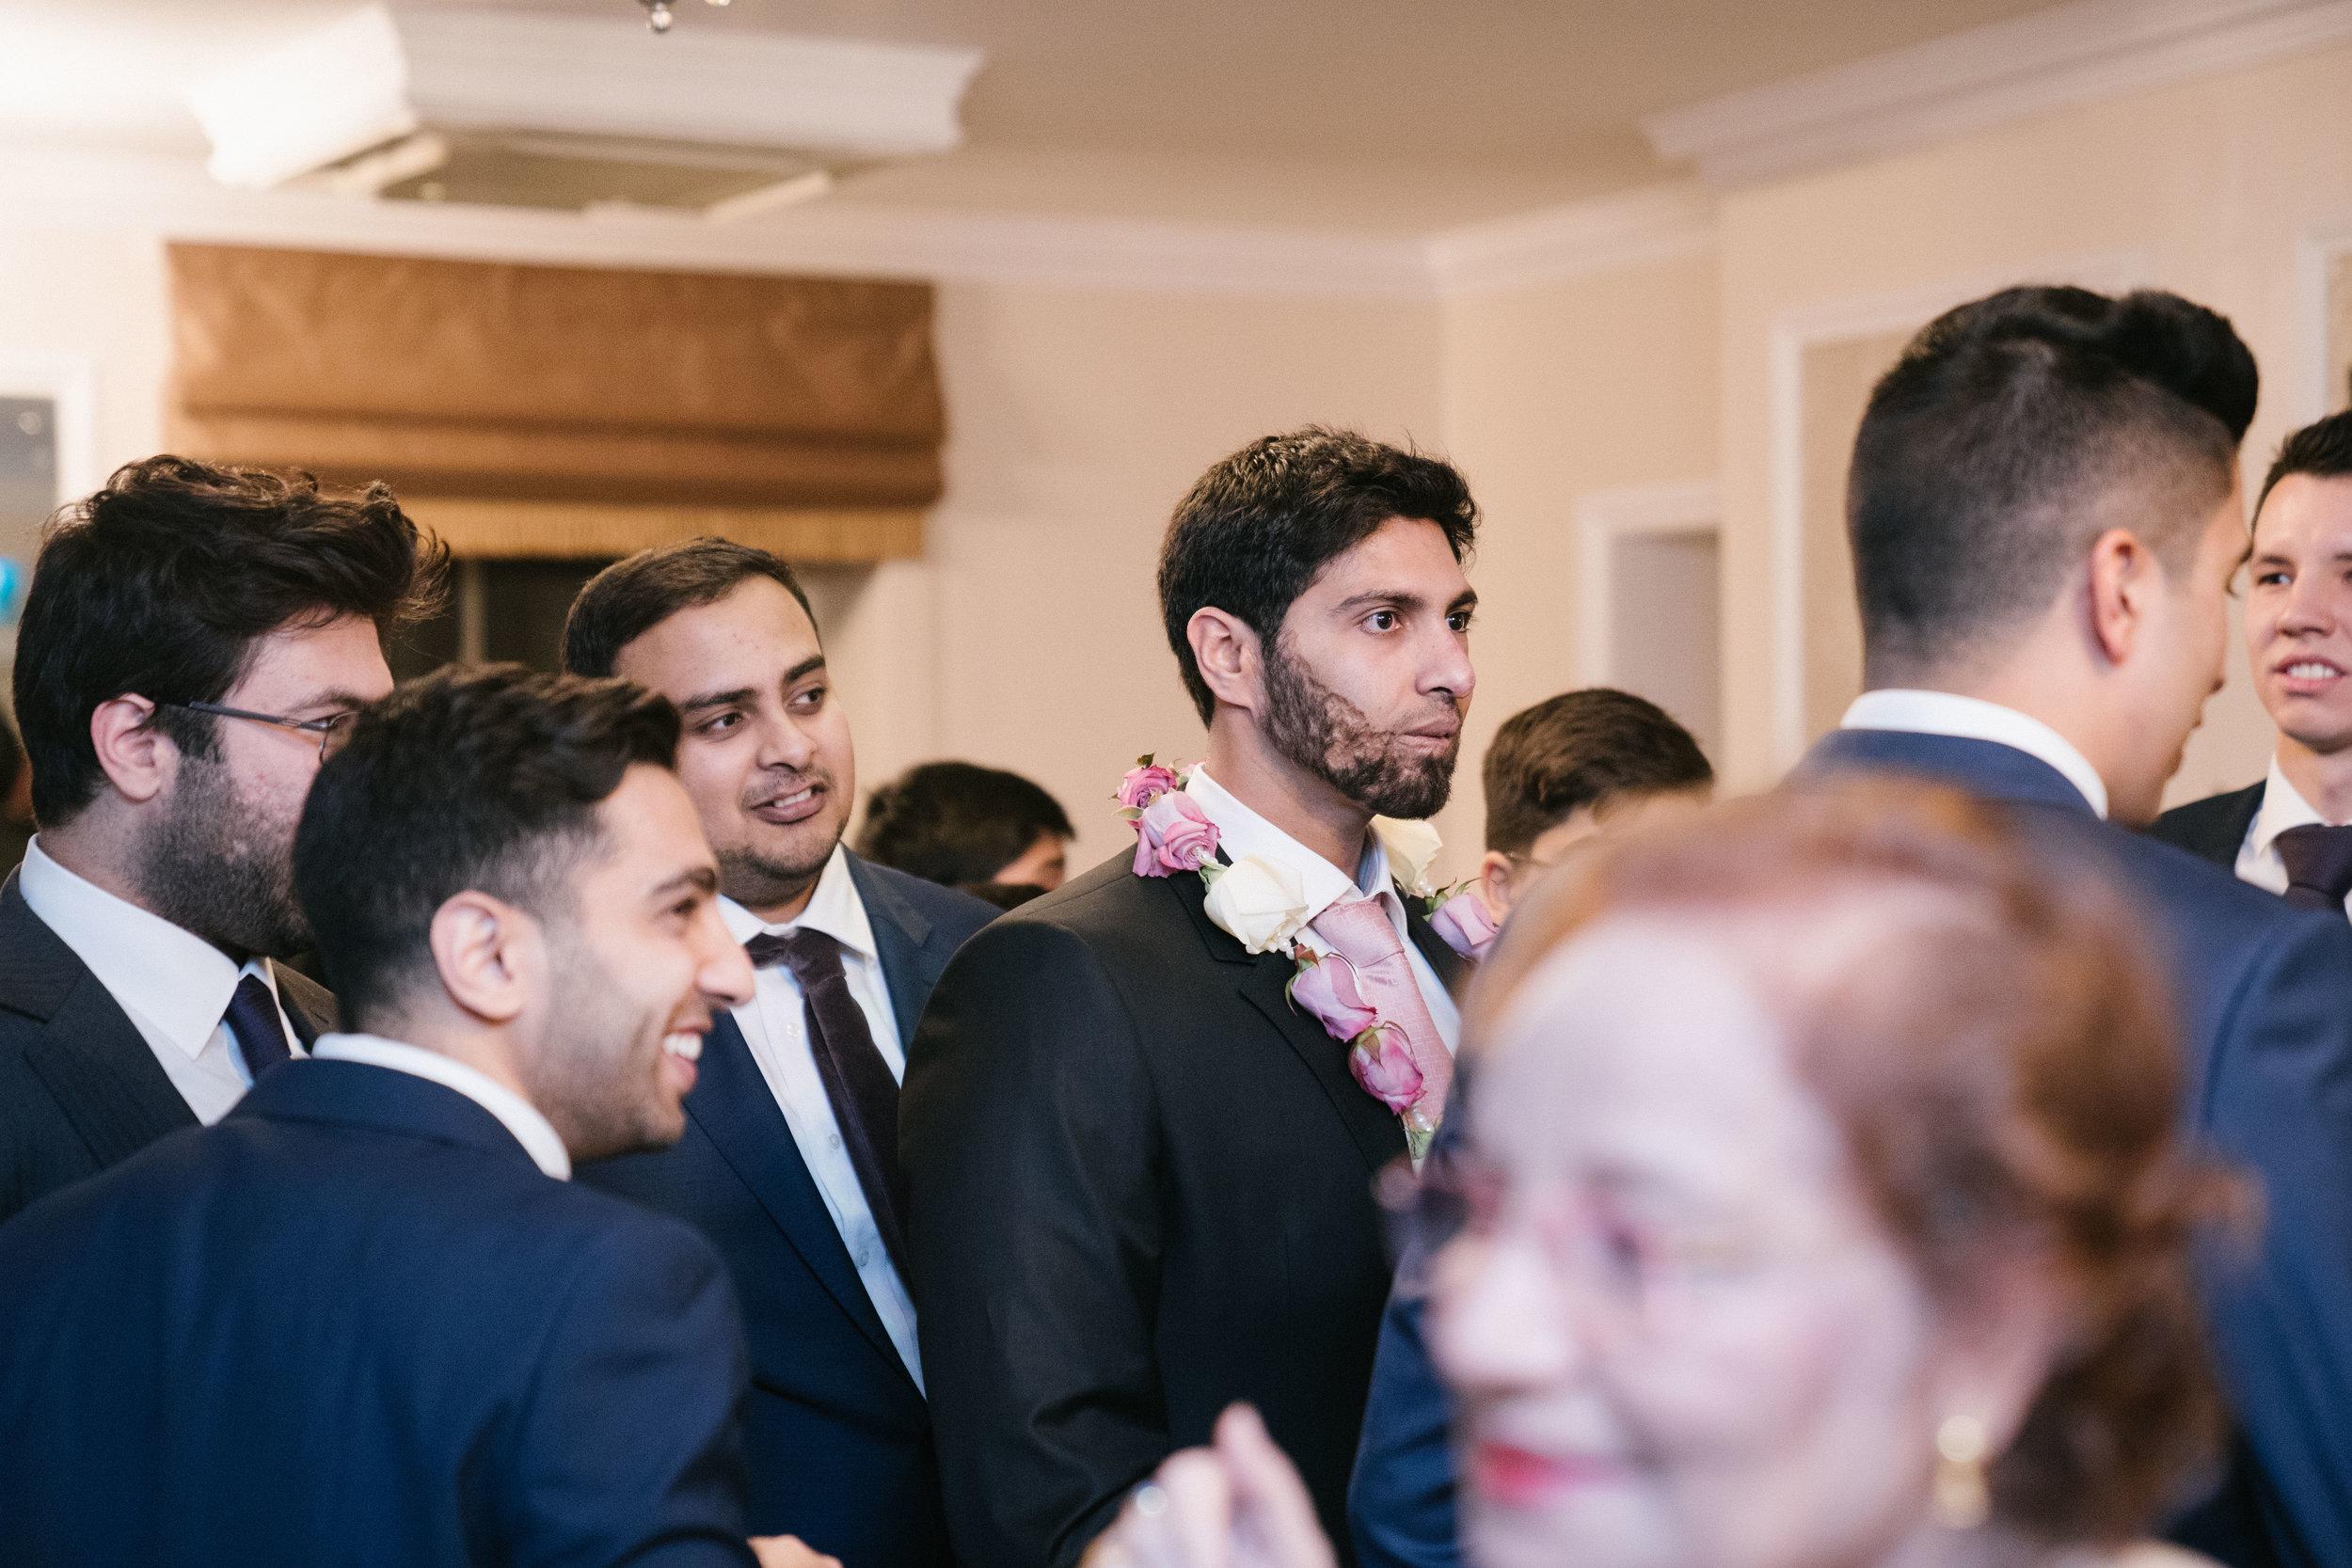 buckinghamshire-golf-club-winter-muslim-wedding-engagement-photography-videography-112